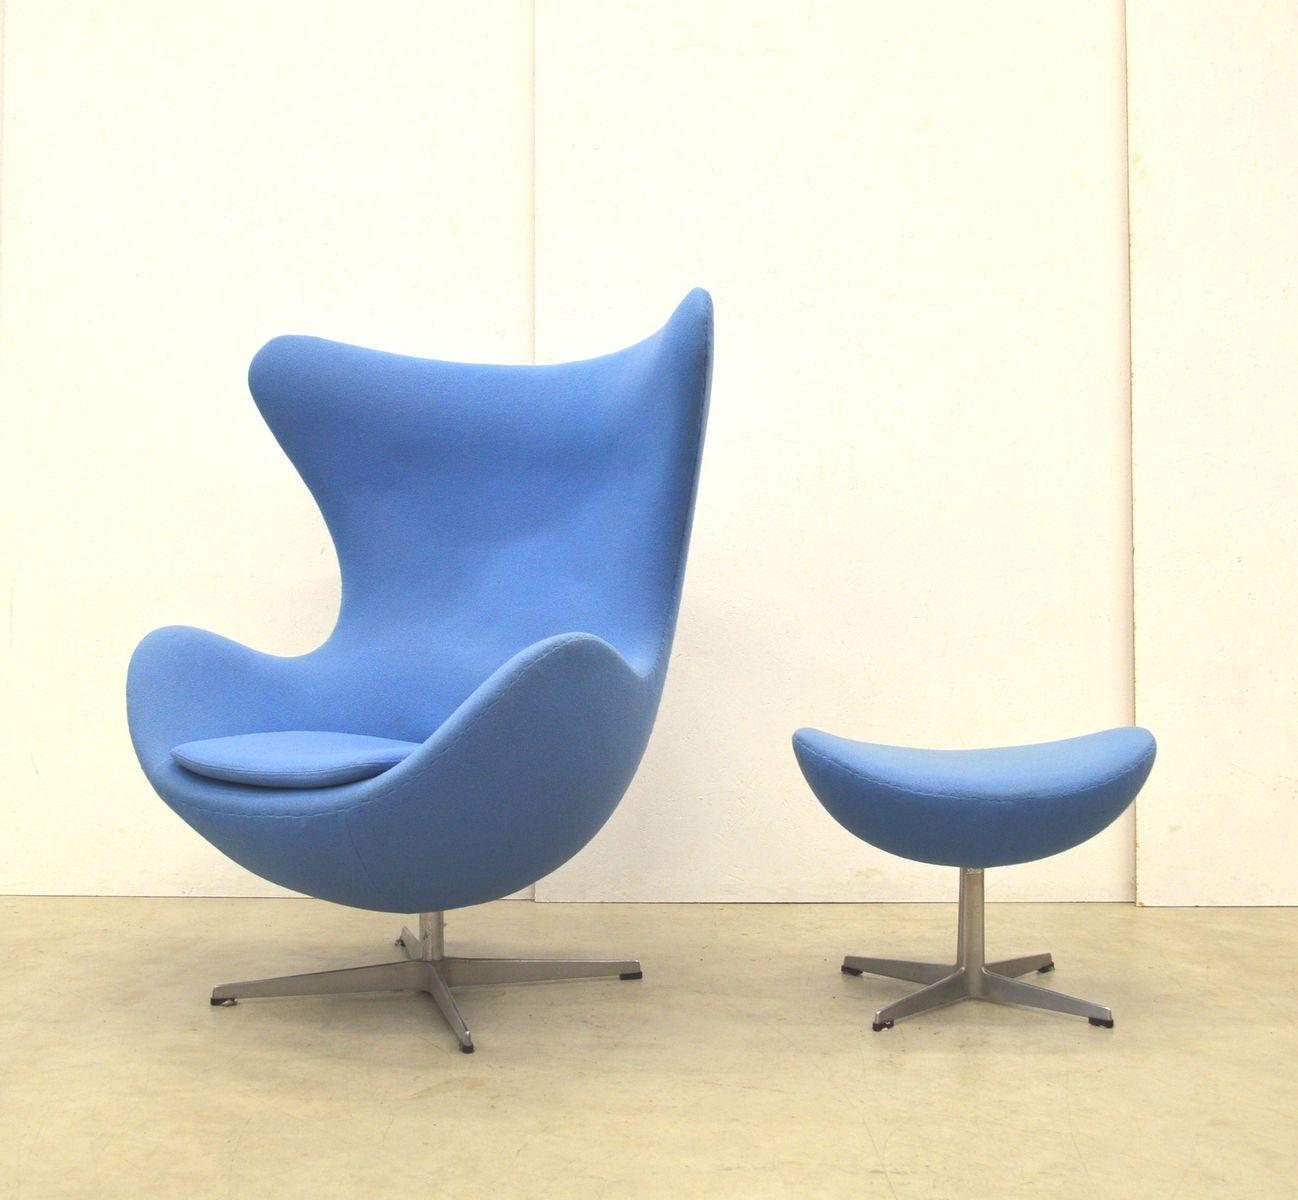 egg chair ottoman by arne jacobsen for fritz hansen. Black Bedroom Furniture Sets. Home Design Ideas